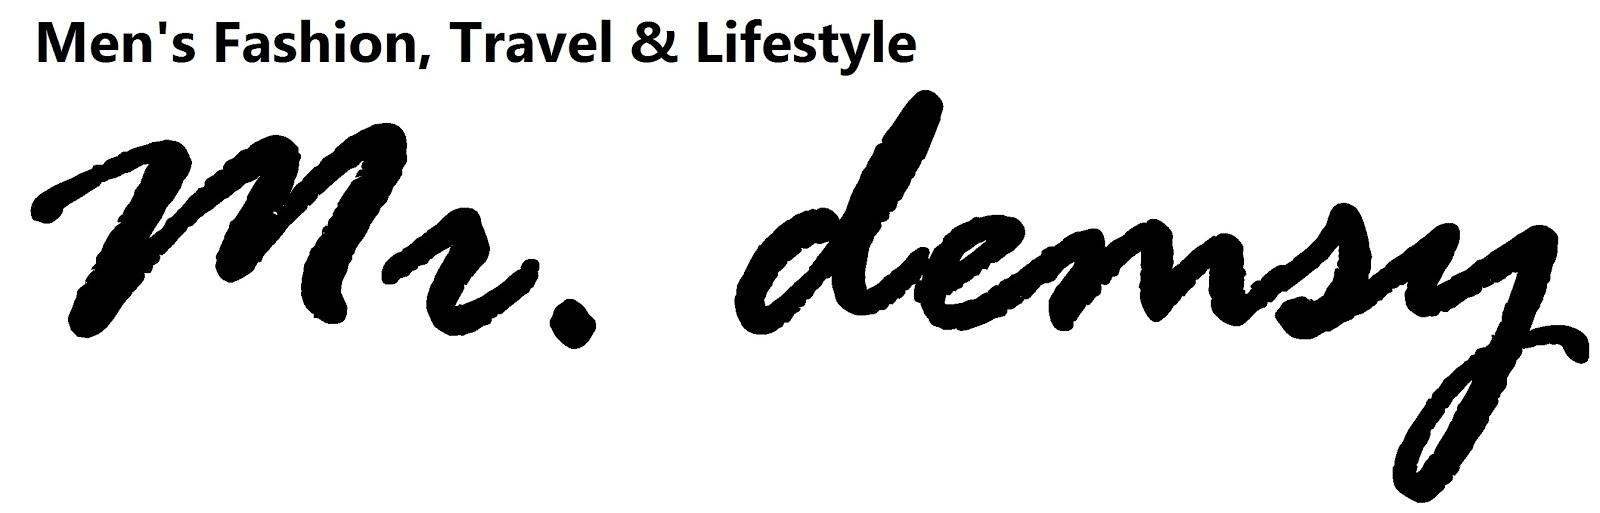 MR DEMSY - Men's Fashion, Travel & Lifestyle